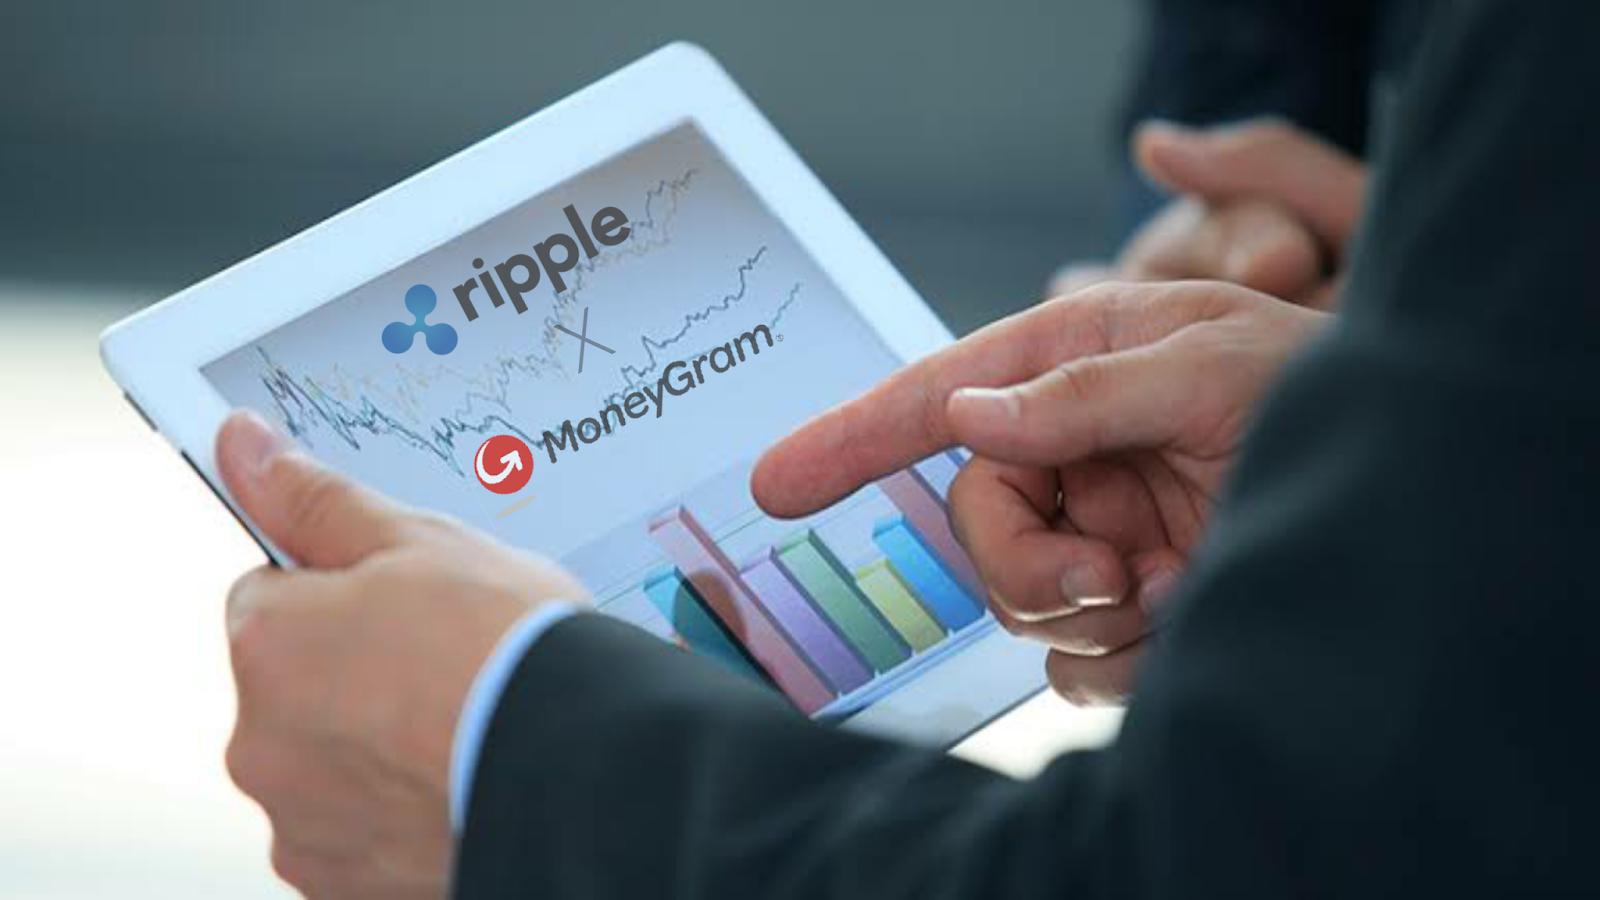 ripple membeli saham MoneyGram, berita ripple terbaru, berita ripple hari ini, berita cryptocurrency hari ini, berita cryptocurrency terbaru, perkembangan cryptocurrency, perkembangan ripple, moneygram, platform pembayaran lintas batas, platform pembayaran internasional, jual beli saham, berita bisnis hari ini,